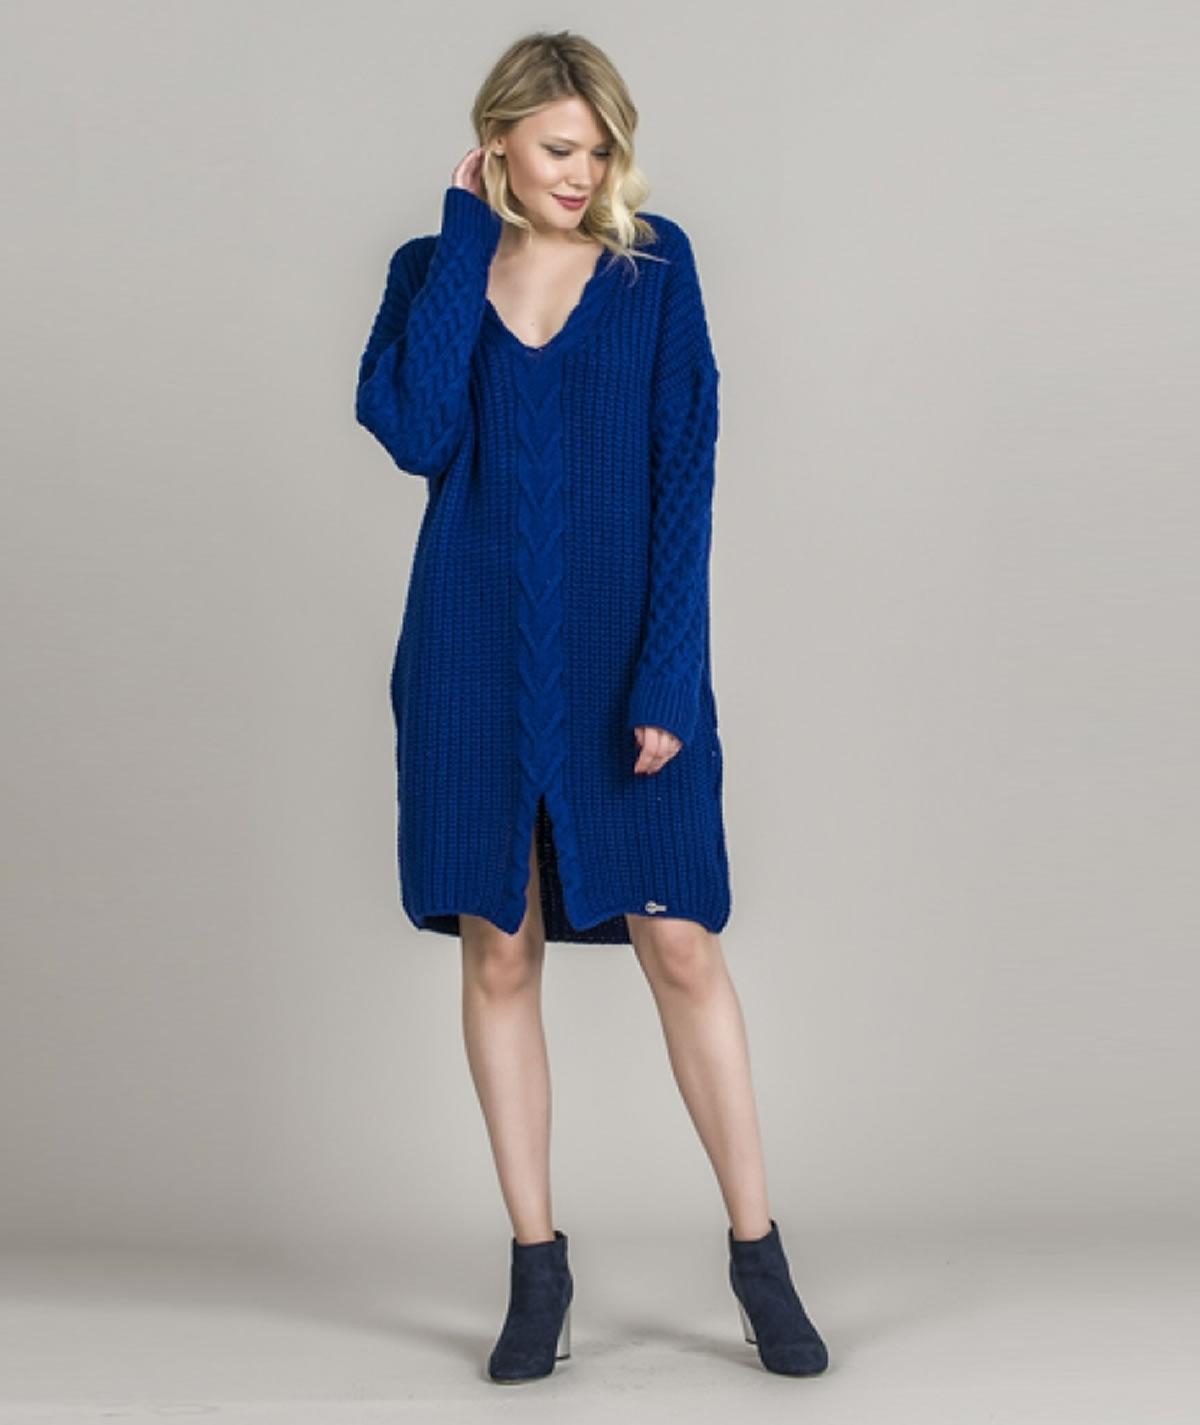 [CHIESSY] Vestido oversize